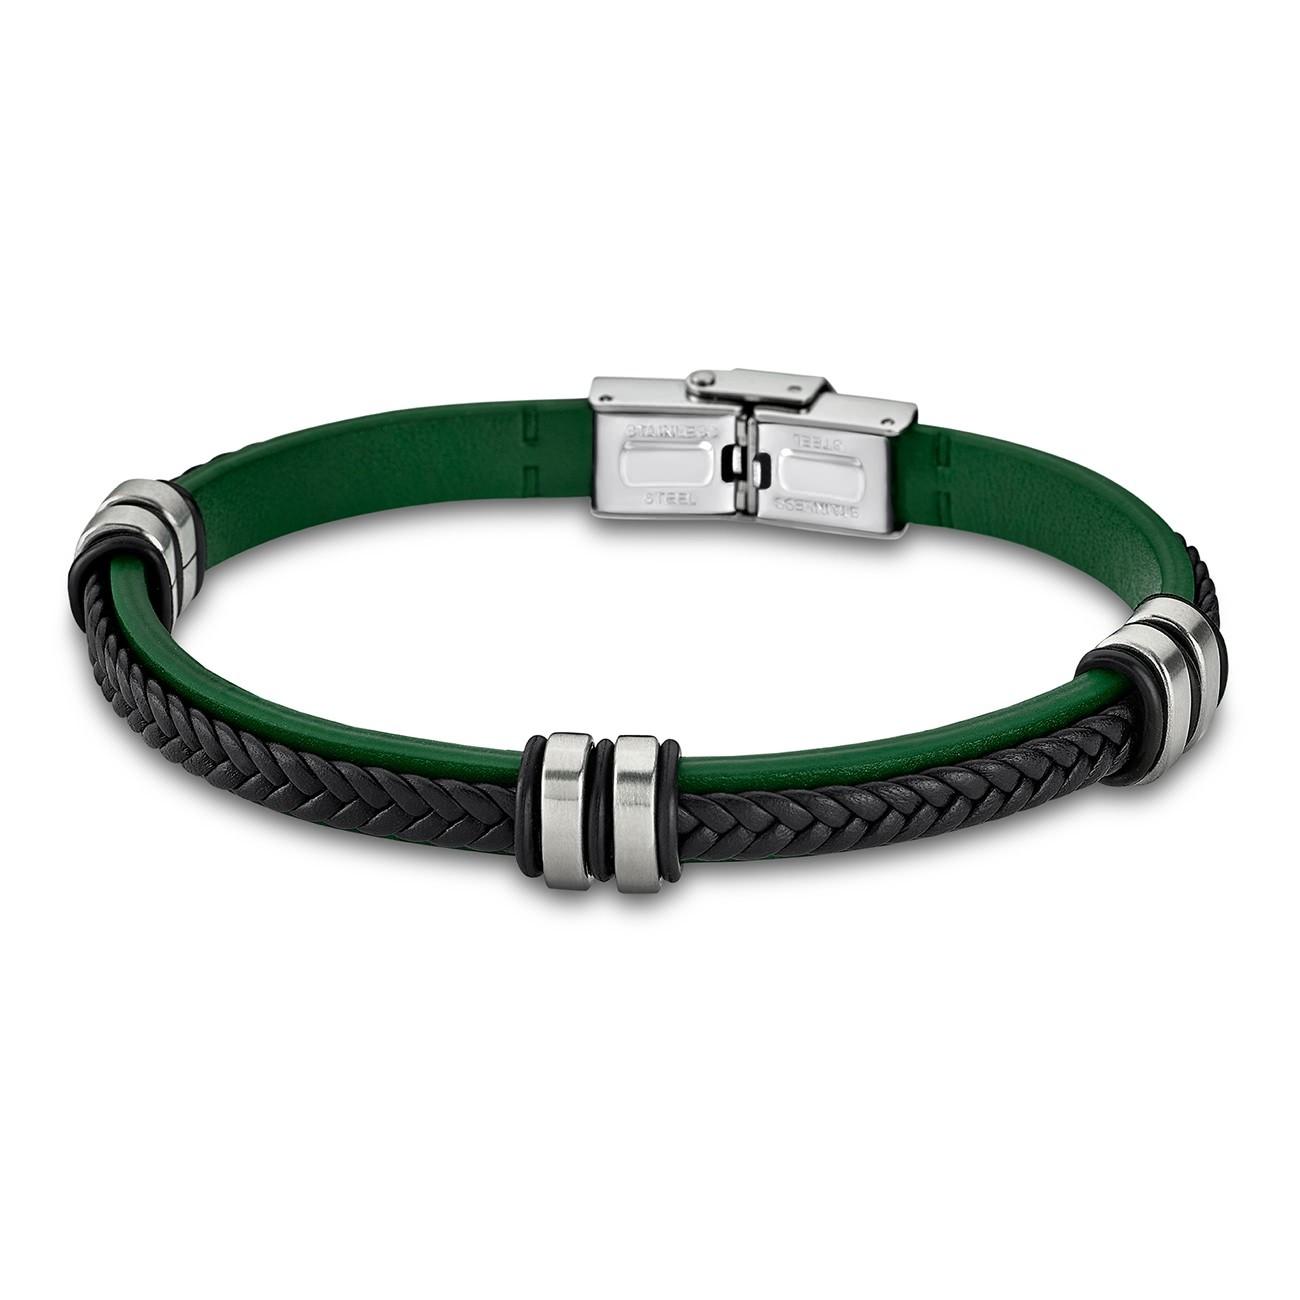 LOTUS Style Armband Damen Herren LS1829-2/2 Leder grün schwarz JLS1829-2-2